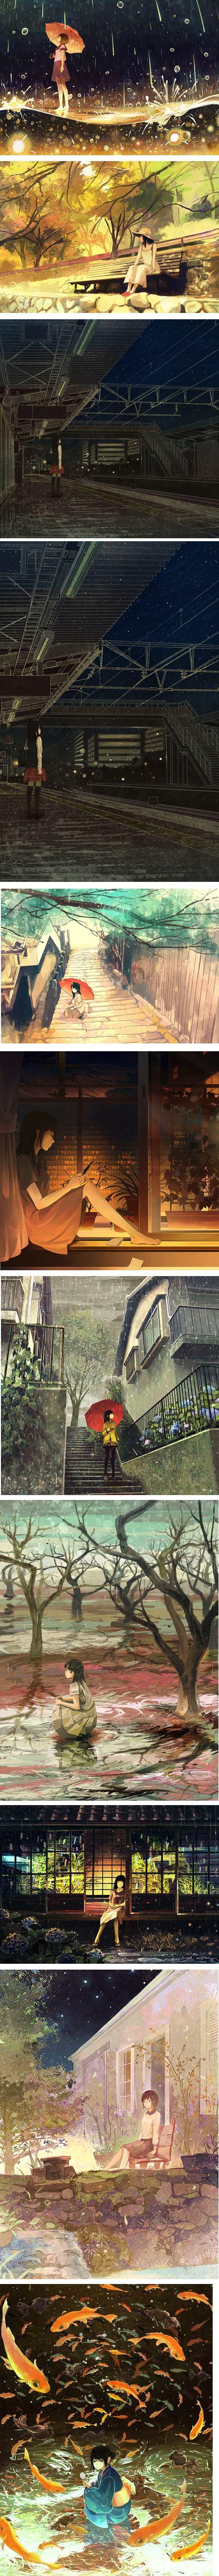 Japanese illustrator in watercolor